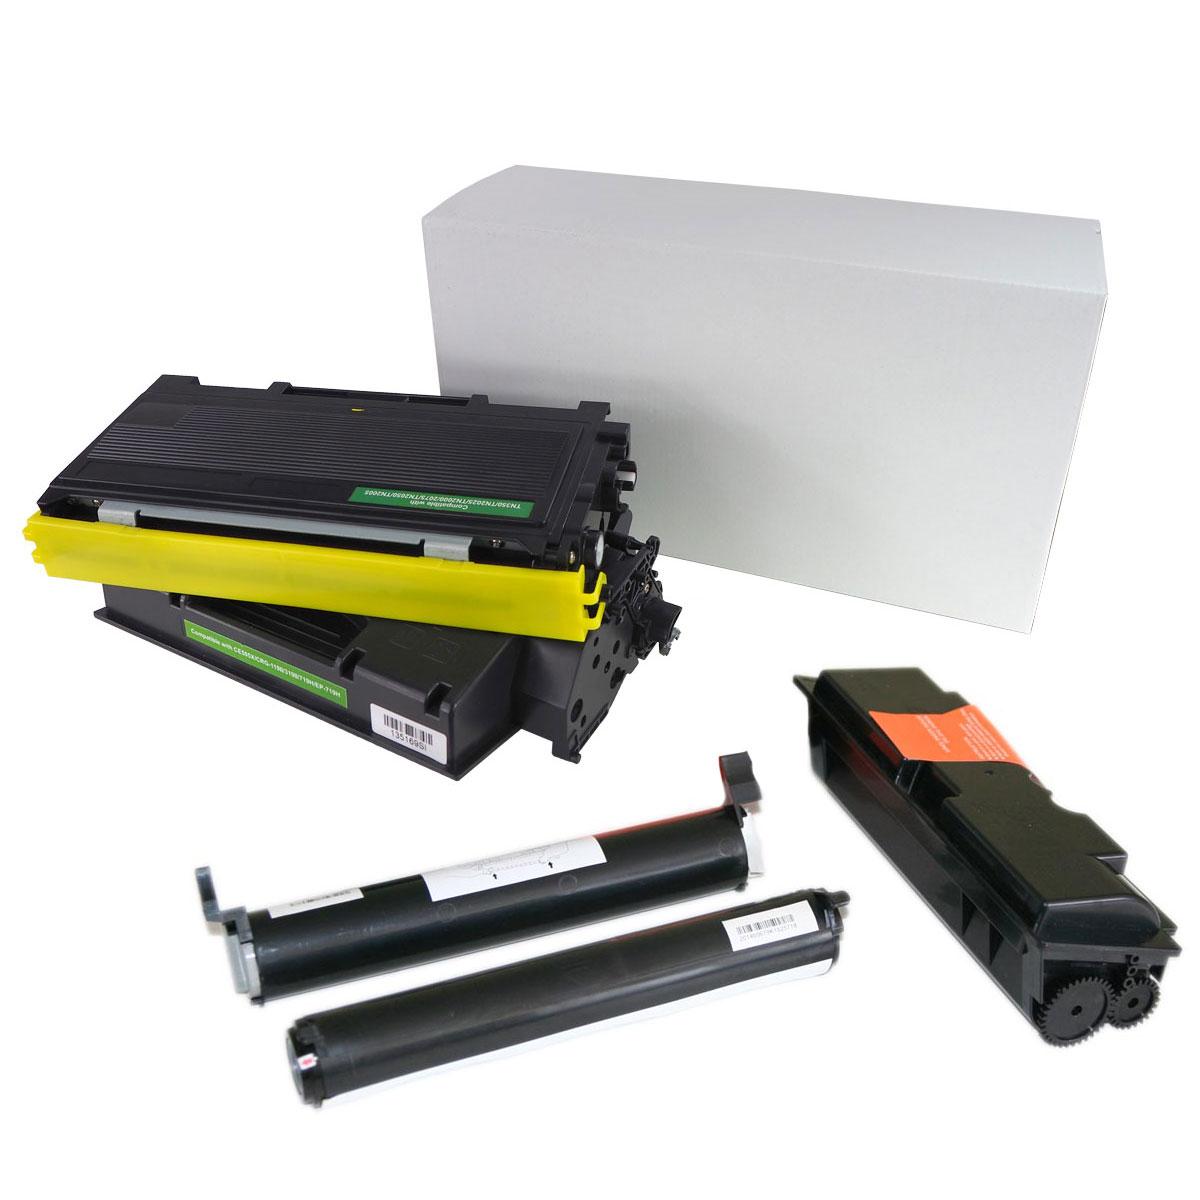 Toner HP LJ Pro M 1217 Zamiennik w pudełku eko